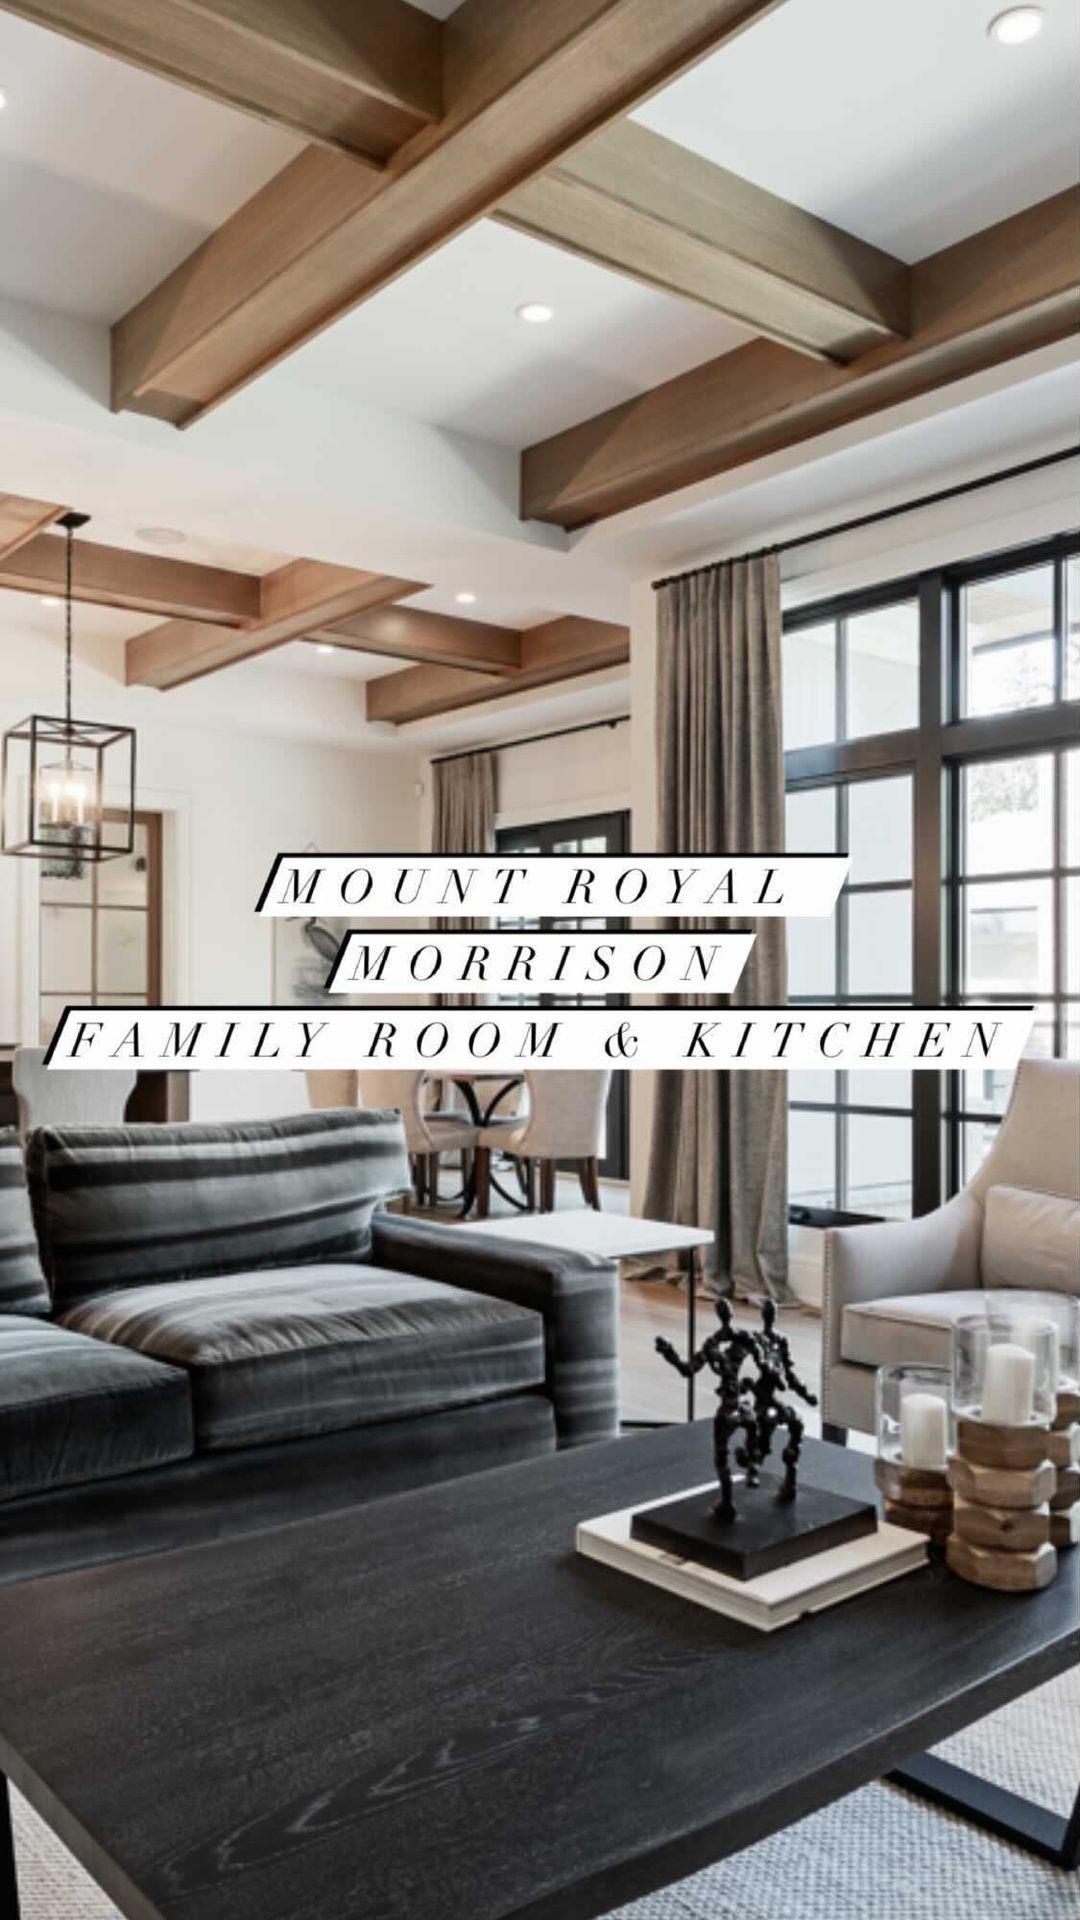 verandaestatehomes on Instagram: Dream home alert, those ceiling beams add so much to this home! #interiors #customhome #houseenvy #livingroom #livingroomdecor…